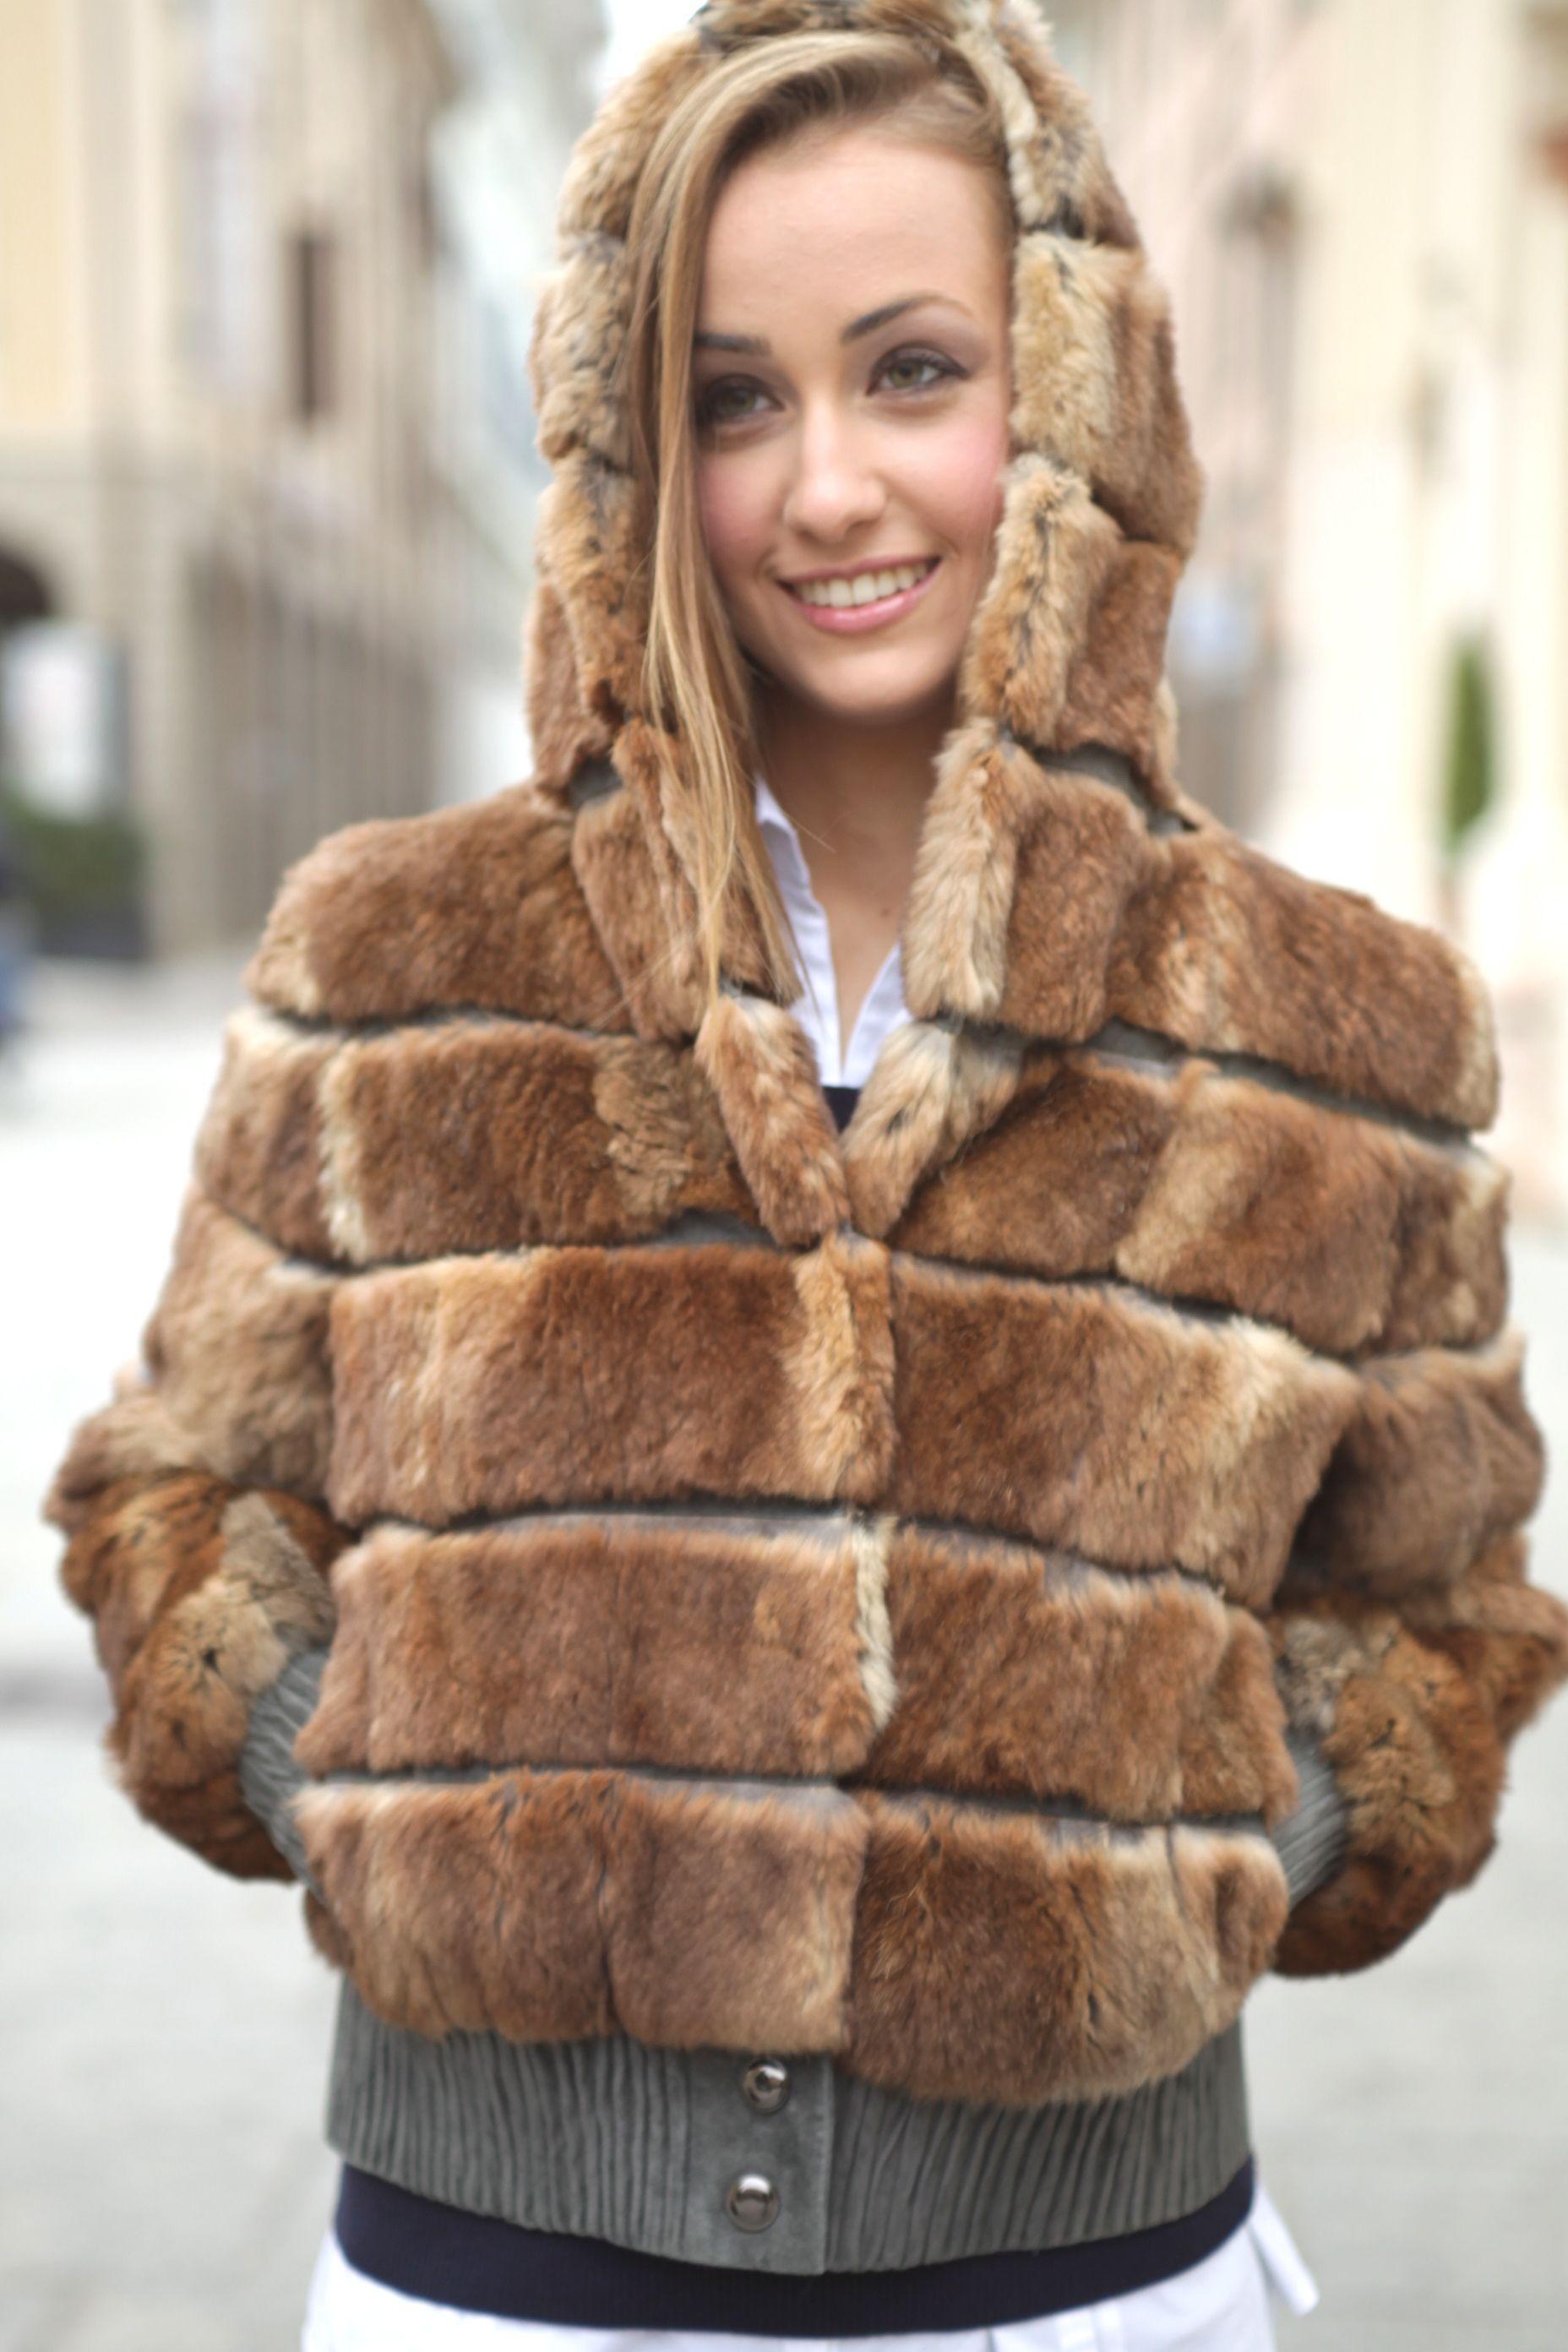 Yellow Rabbit Jacket P Furs Schierafrancesca